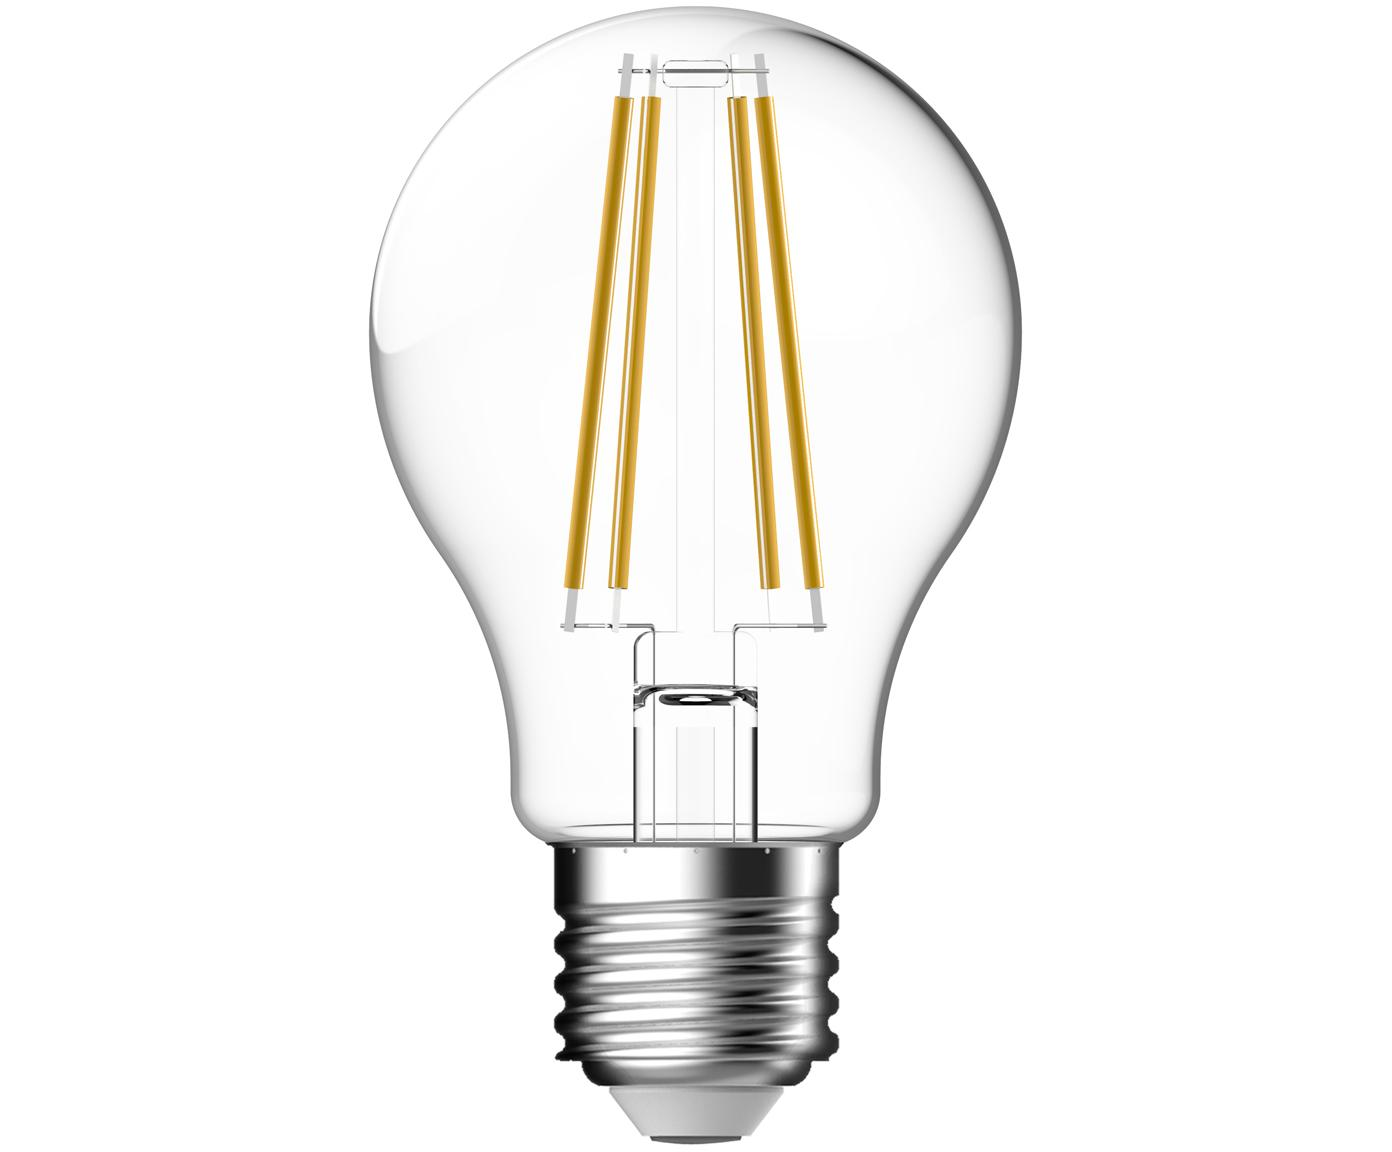 Lampadina a LED Clear (E27 / 7Watt), Lampadina: vetro, Trasparente, Ø 6 x Alt. 11 cm